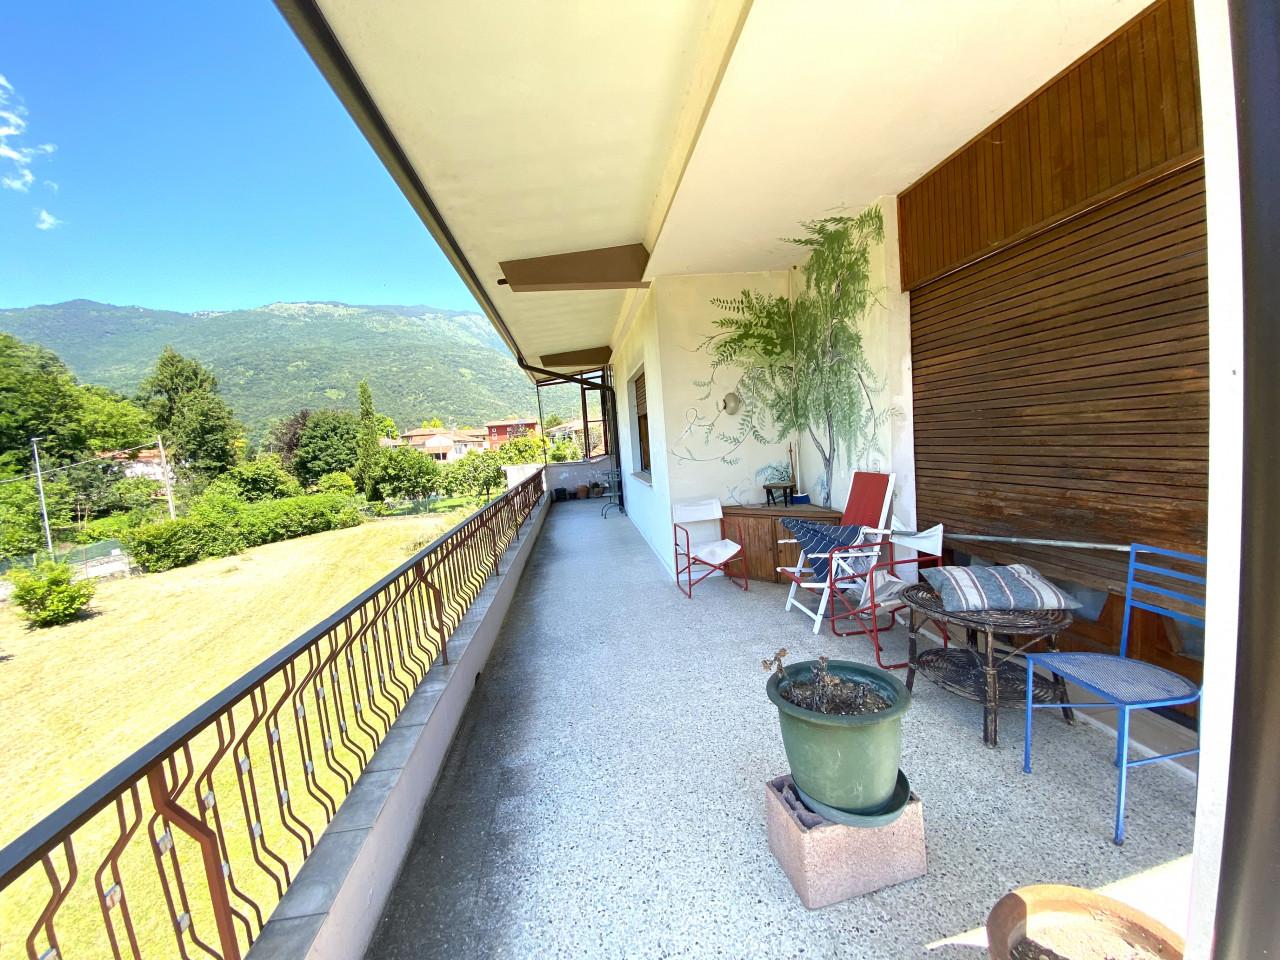 Casa singola con capannone in vendita in centro a Budoia - Rif. V.D.1 https://images.gestionaleimmobiliare.it/foto/annunci/200702/2265893/1280x1280/006__img_2974.jpg